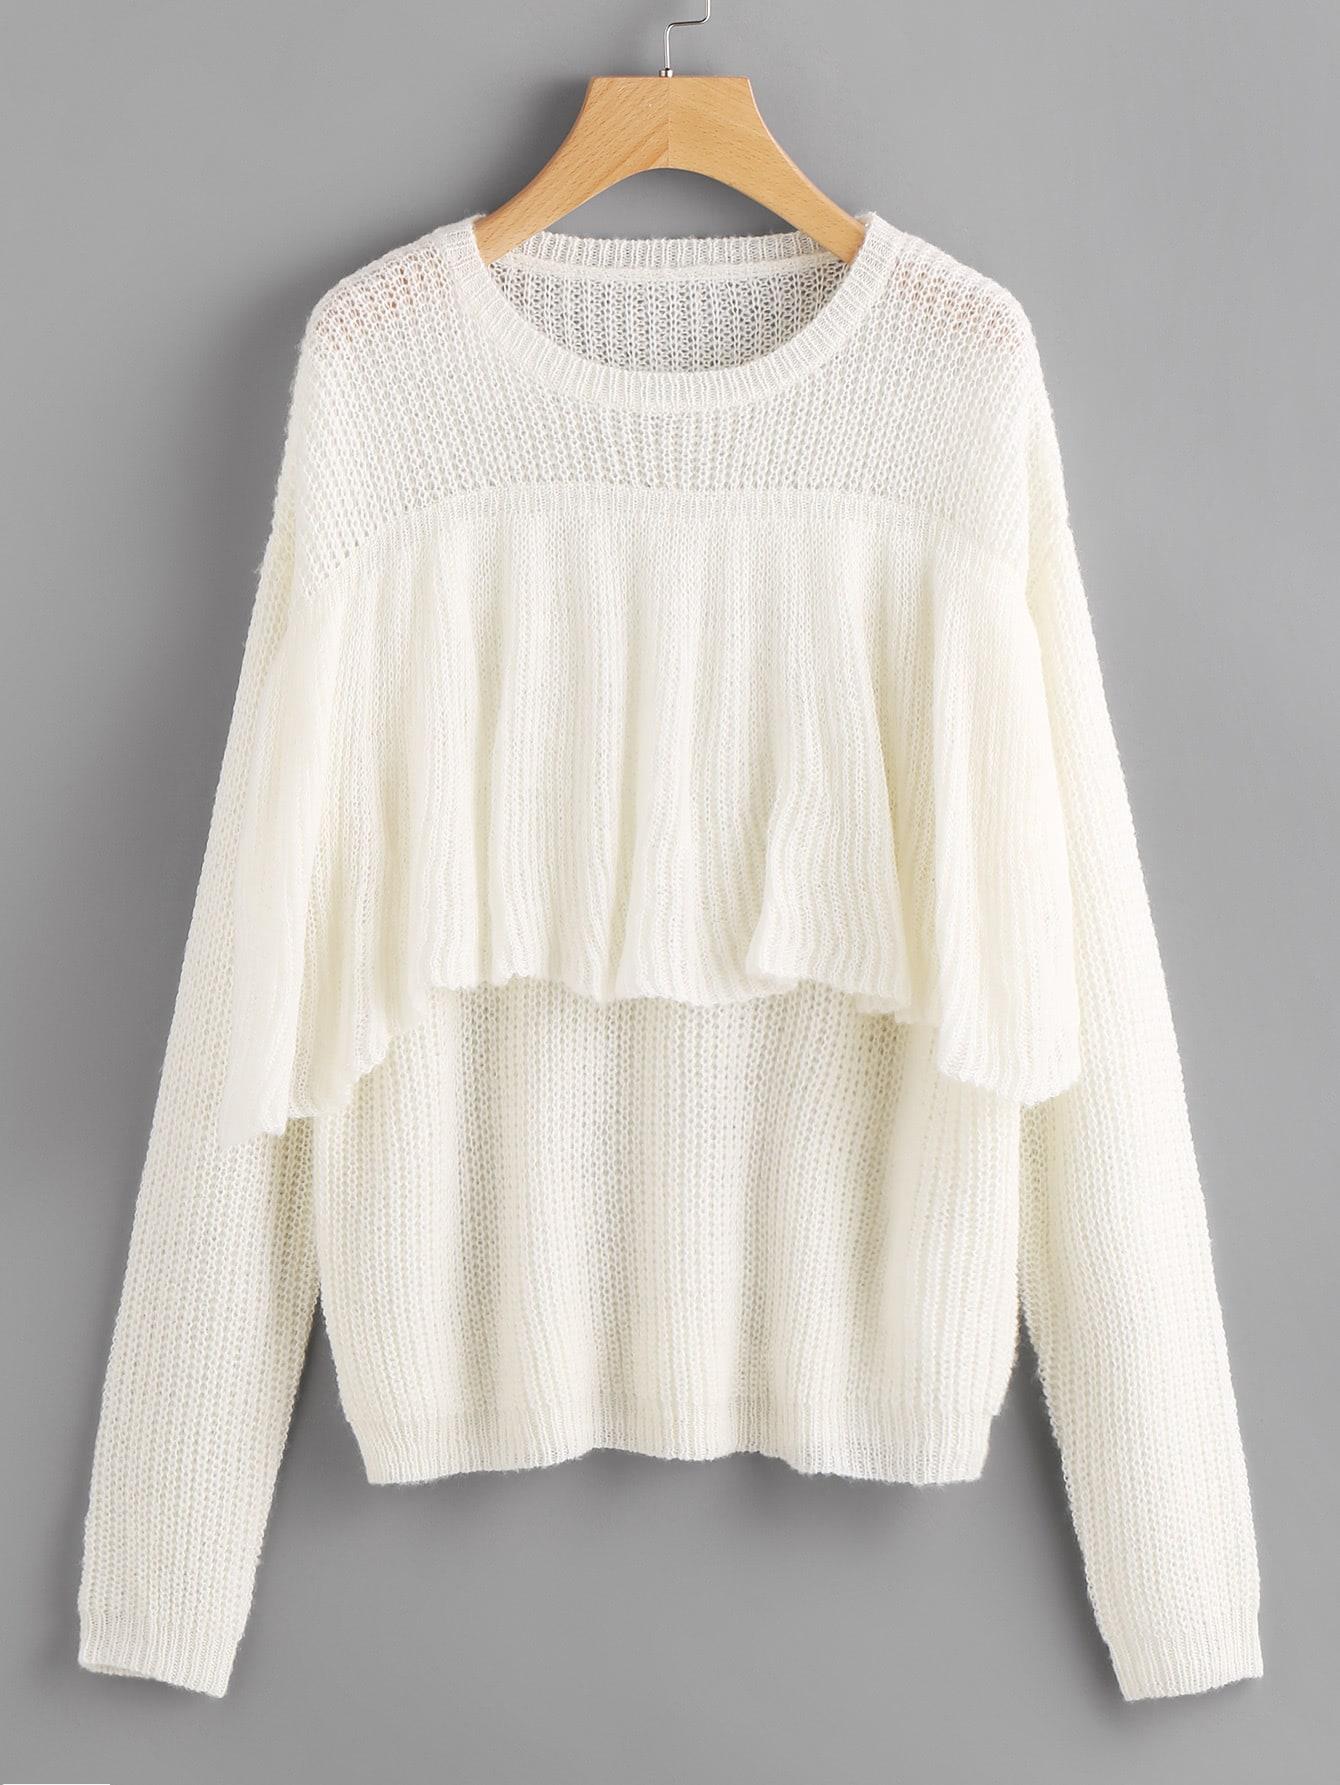 Flounce Trim Loose Knit Jumper flounce trim loose knit jumper